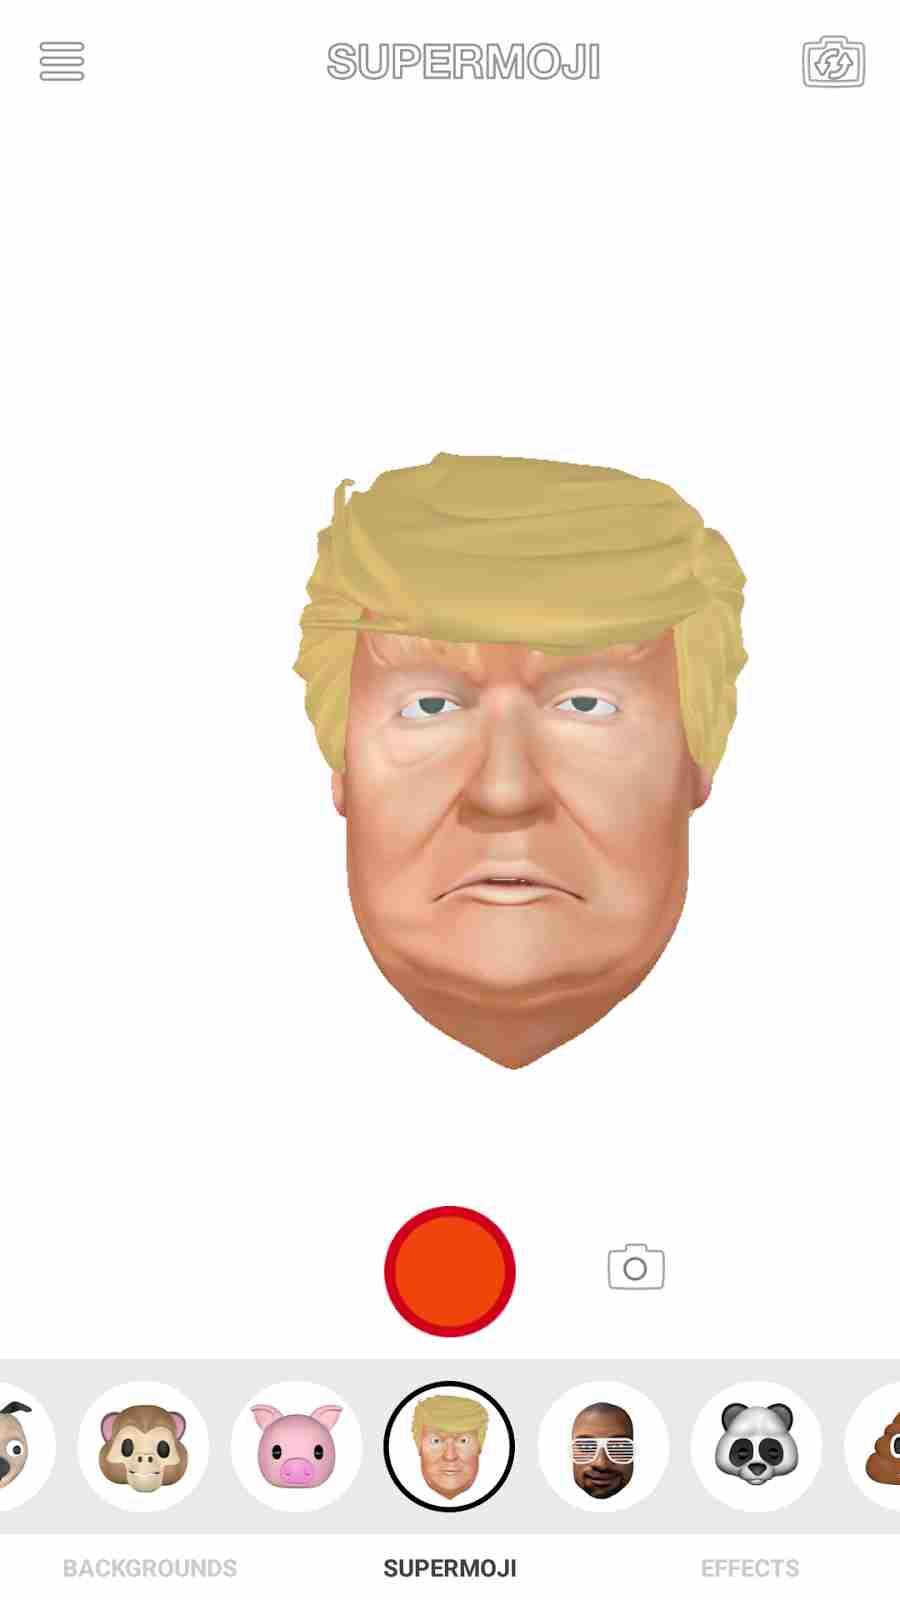 The Apple iPhone X Animoji President Donald Trump Emojis